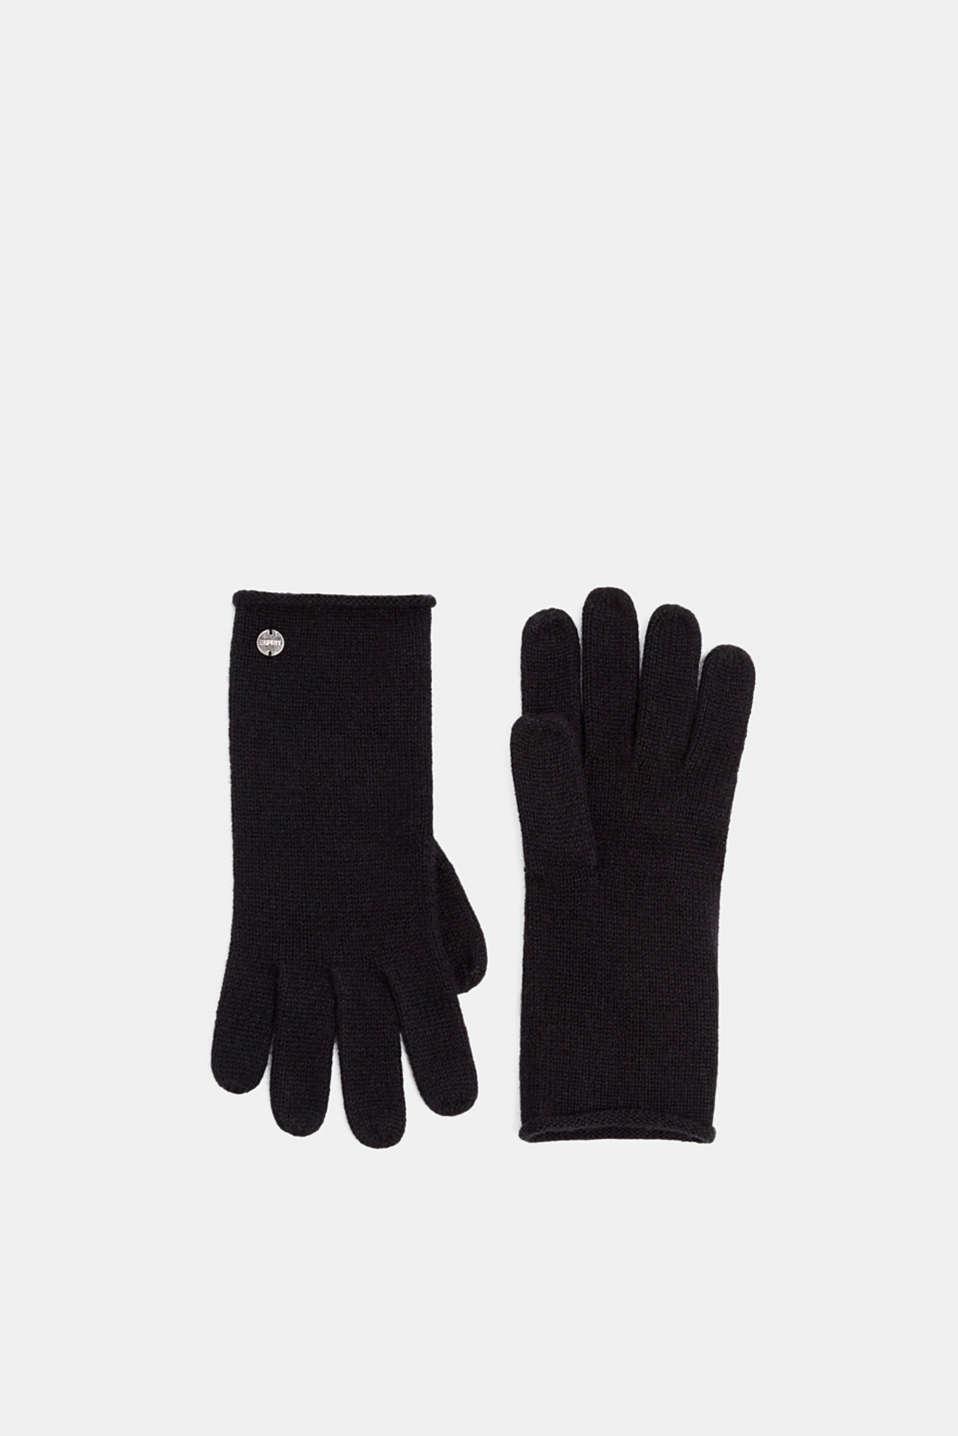 Knit gloves in a cashmere/wool blend, BLACK, detail image number 0